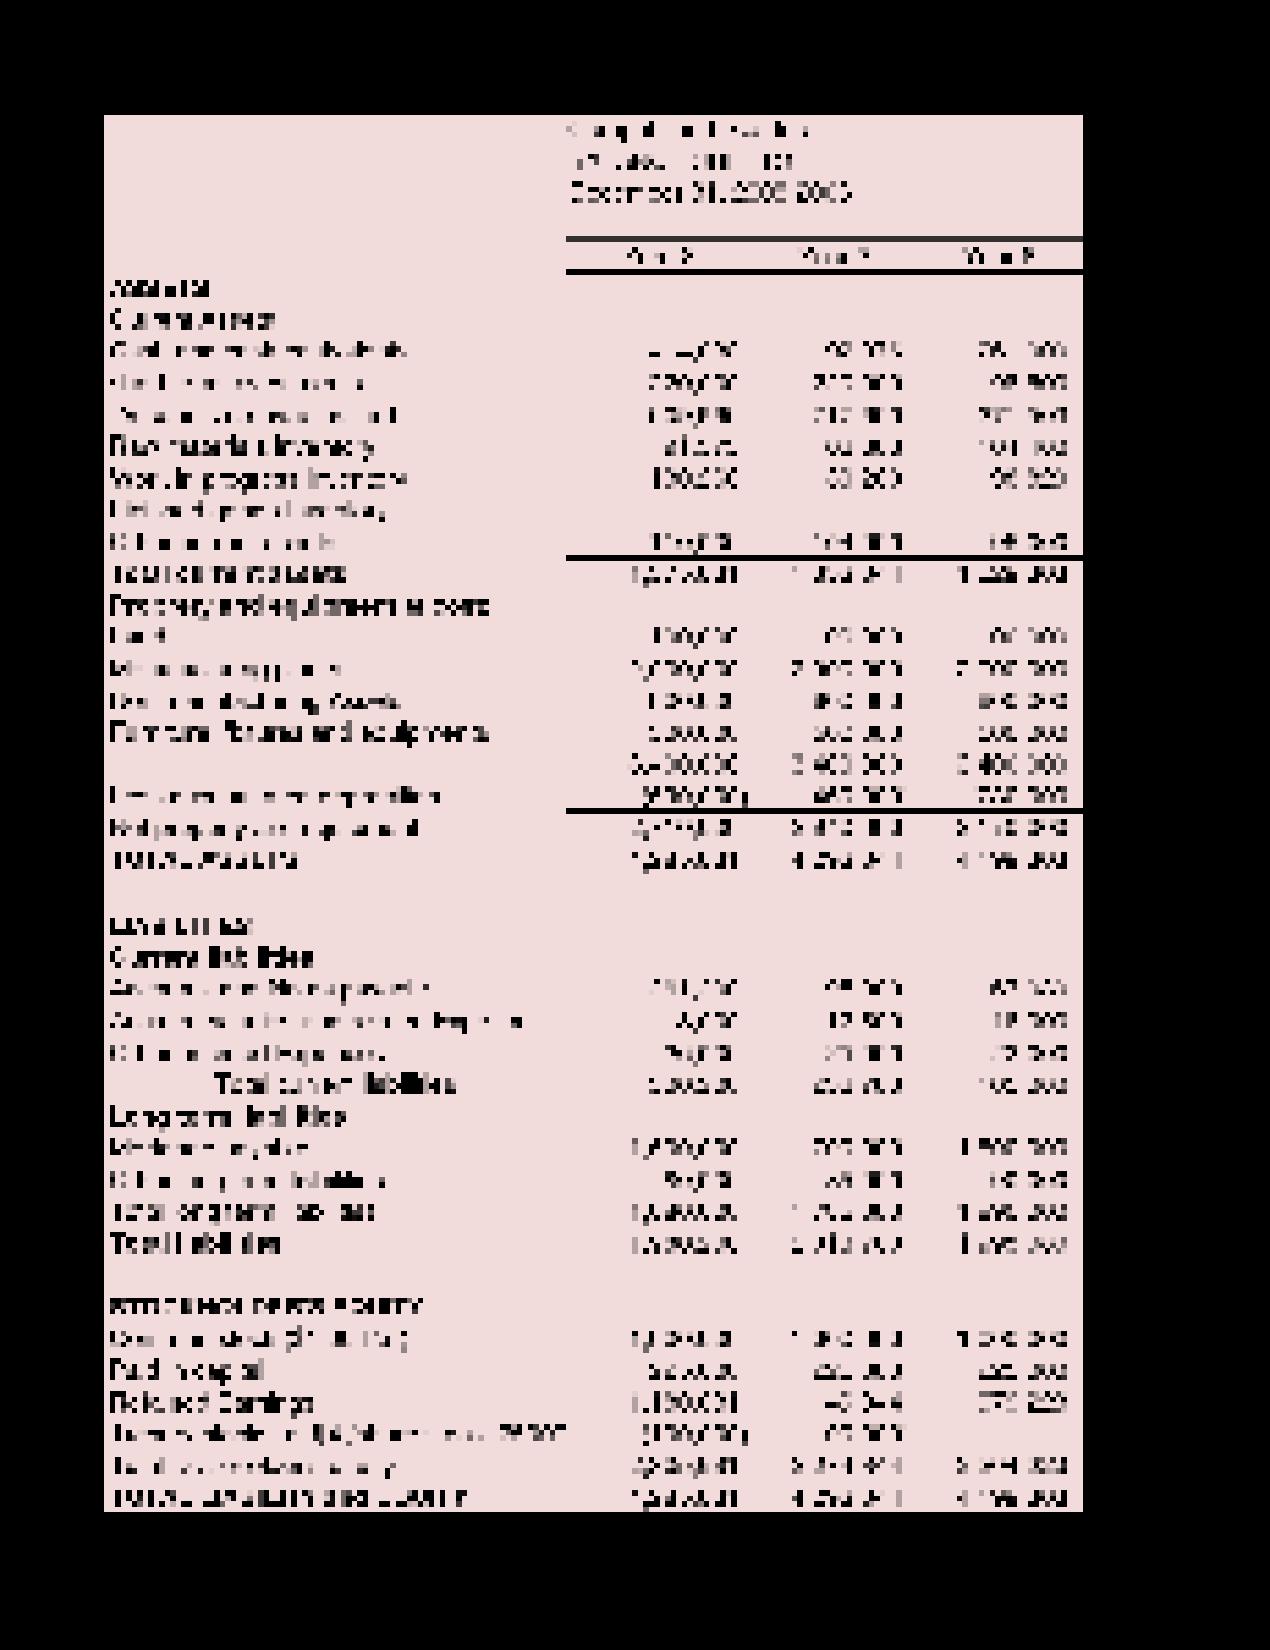 jet2 financial analysis task 3 Jet task 5 custom snowboards inc financial data evaluation notes (1012) (1) uploaded by koebler1313  financial analysis task 1 passed submitted 4-25-13  documents similar to jet task 5 custom snowboards inc financial data evaluation notes (1012) (1) social responsibility task.